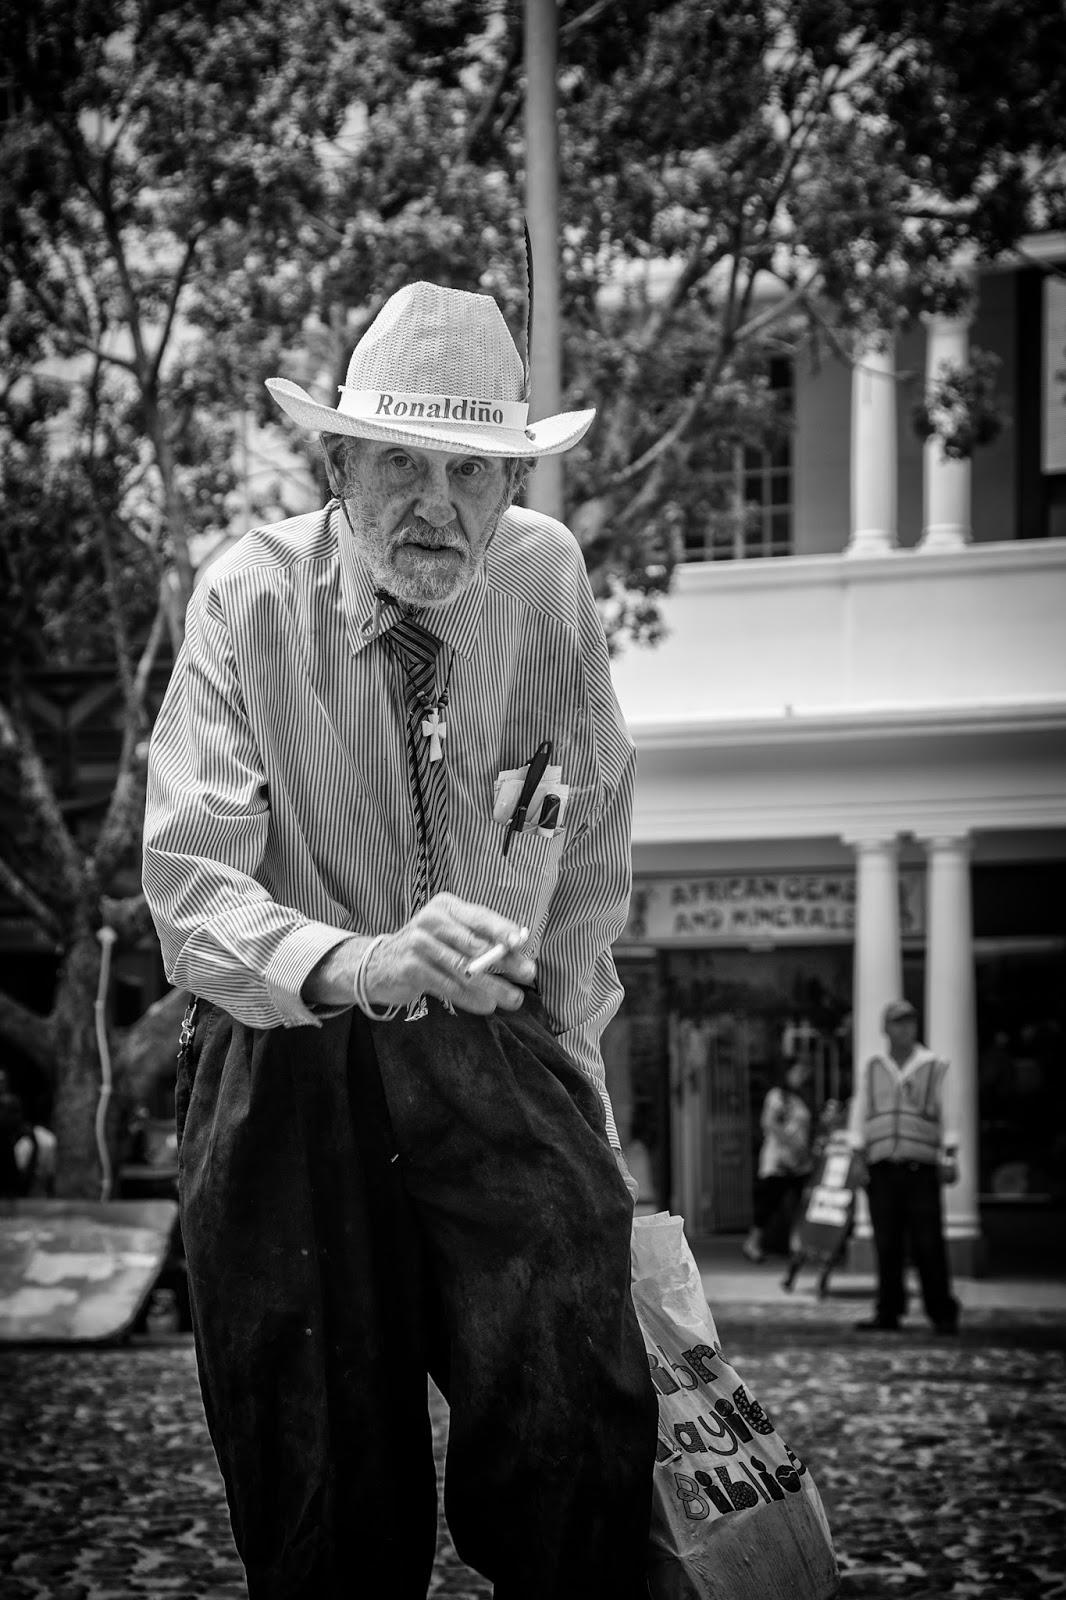 A street portrait shot in Greenmarket square Cape Town